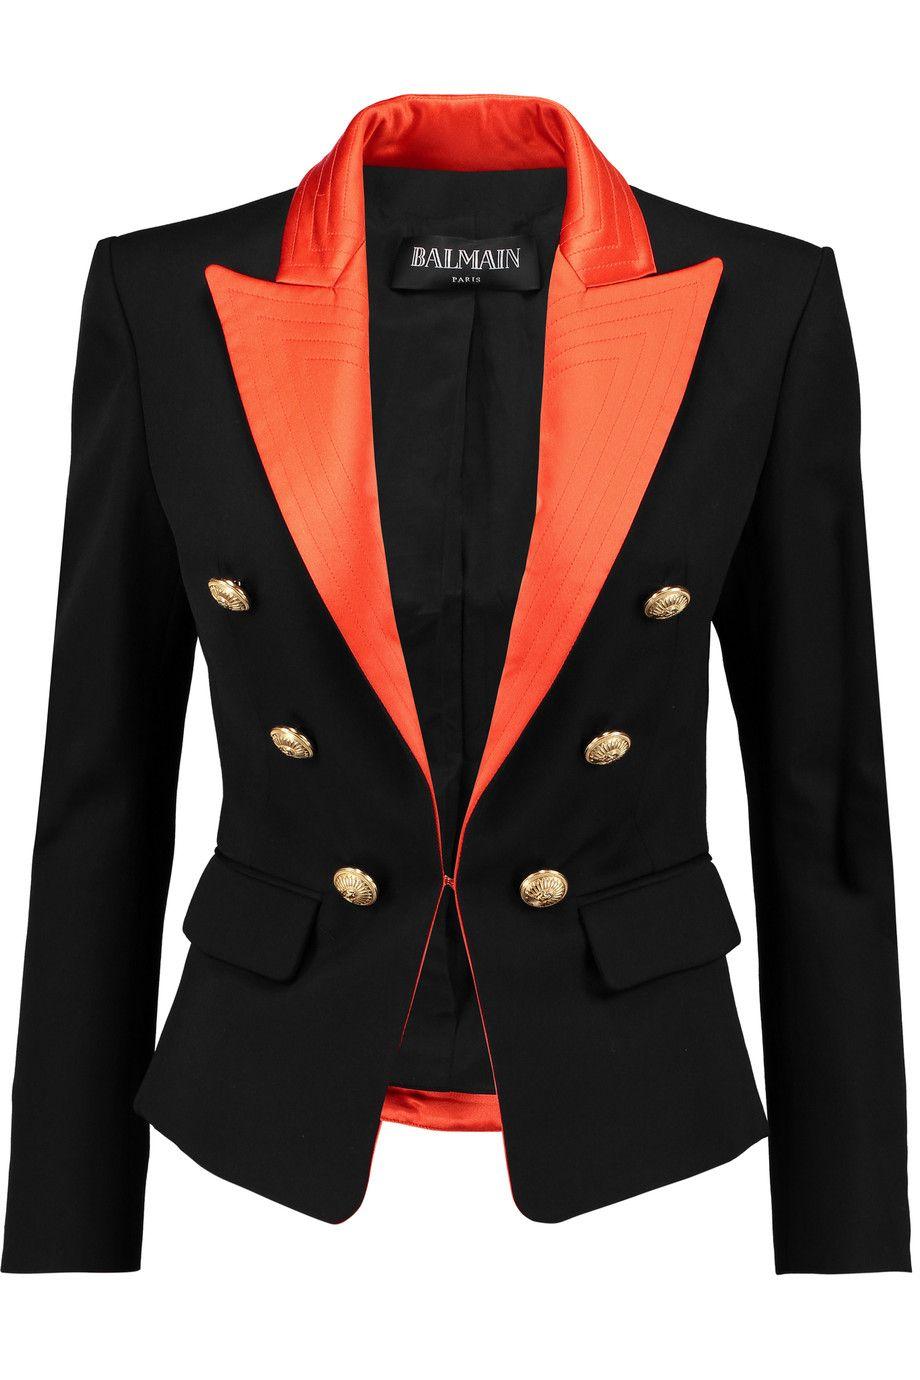 59f720c59d42 BALMAIN Silk satin-trimmed wool blazer. #balmain #cloth #blazer ...